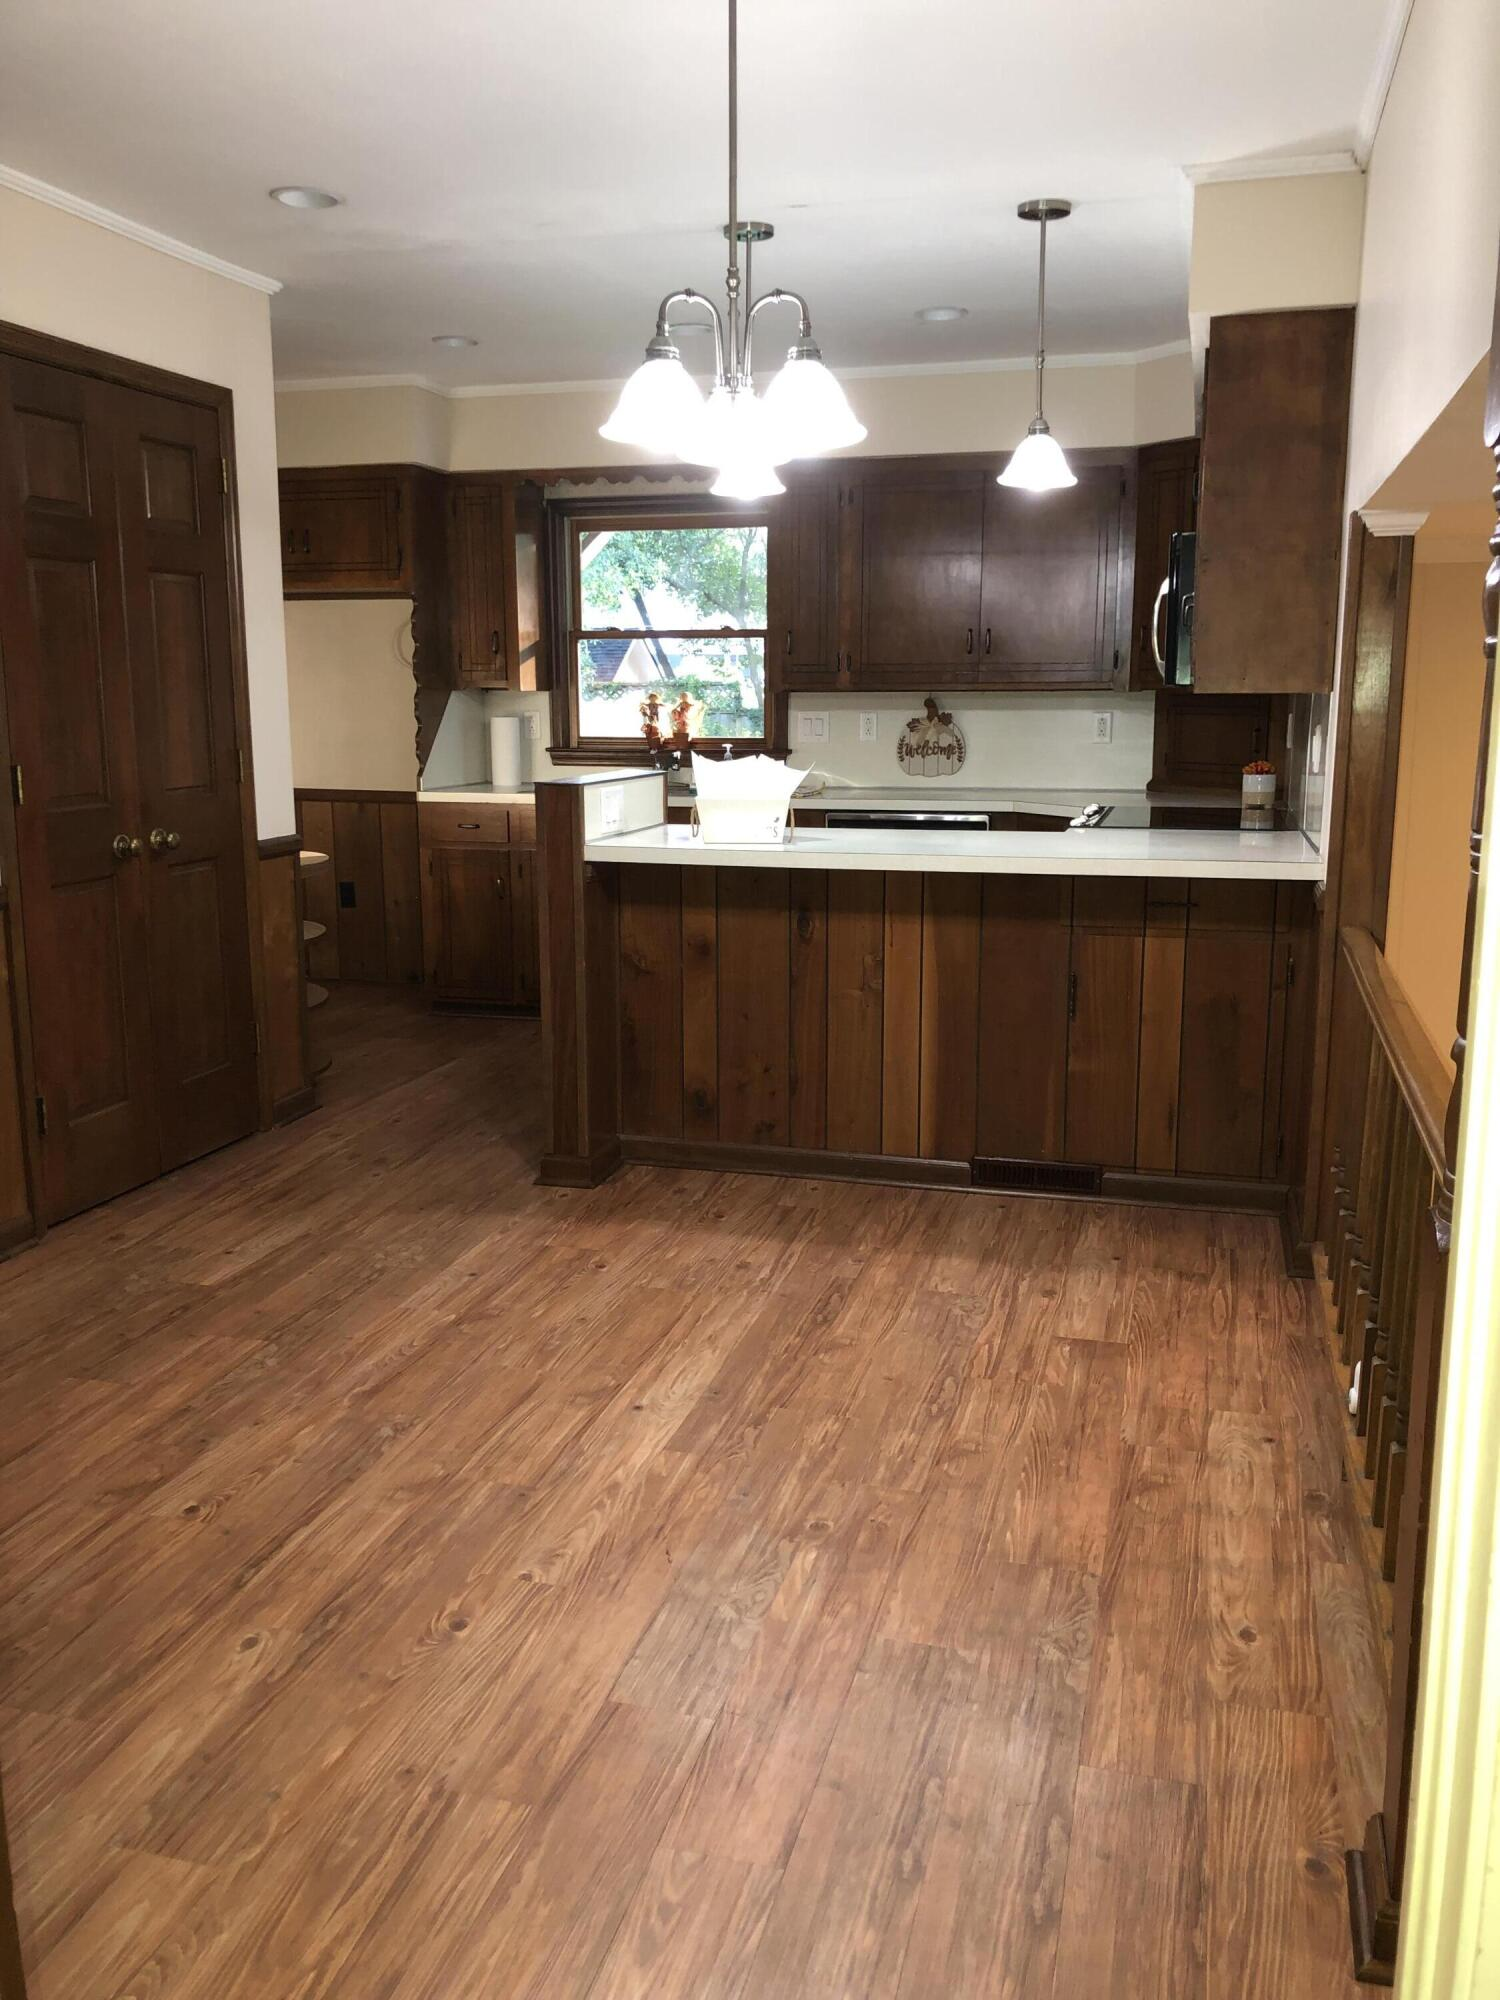 Cooper Estates Homes For Sale - 679 Pawley, Mount Pleasant, SC - 9